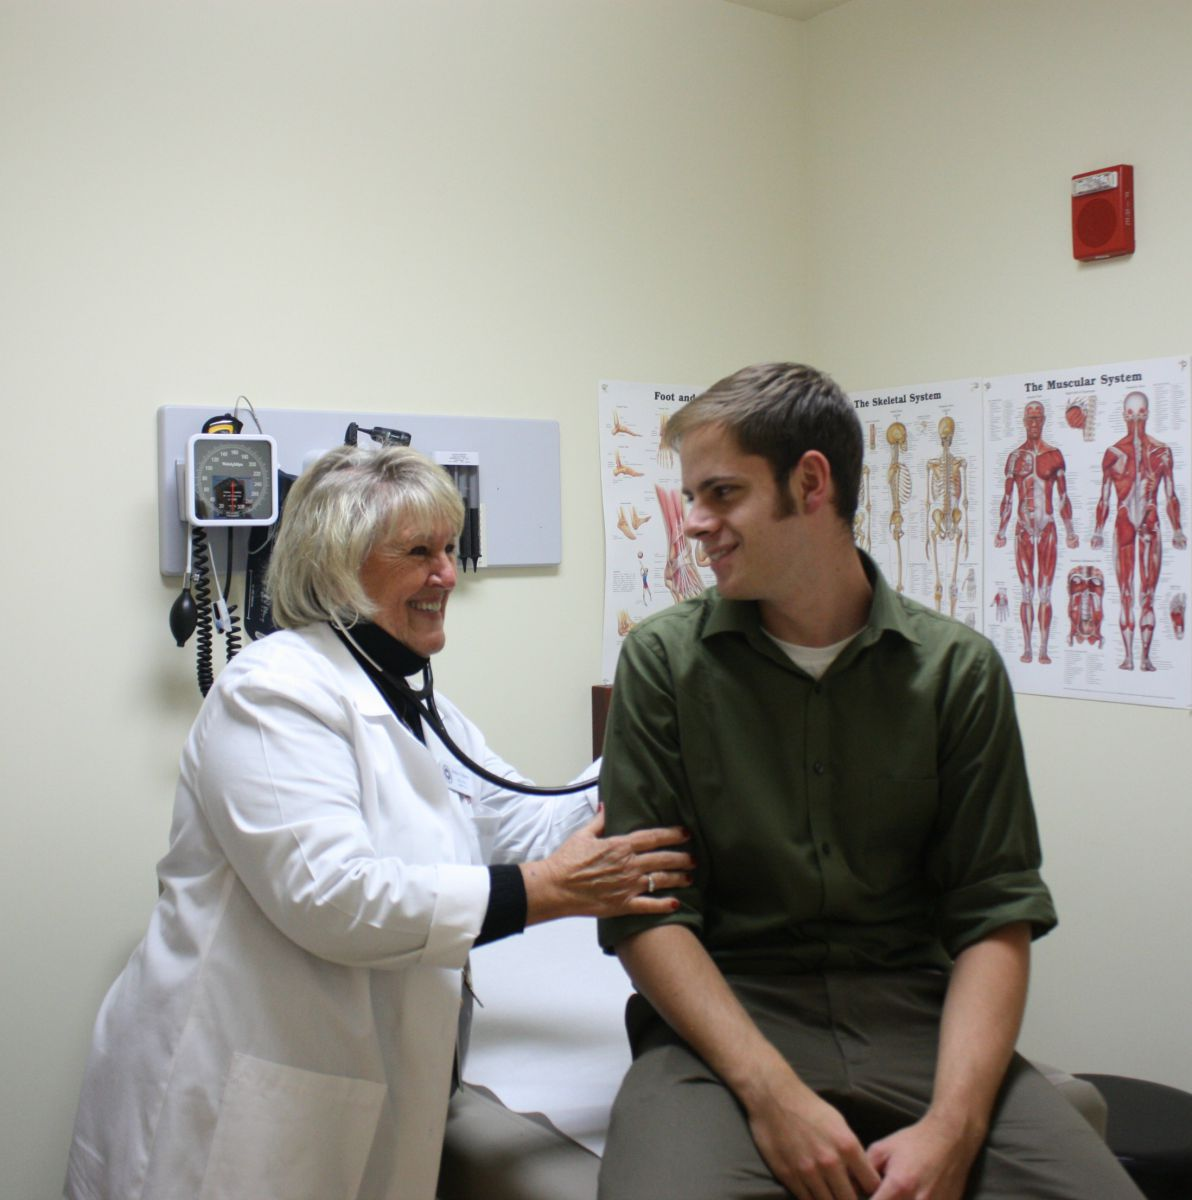 healthcenterwebsite.jpg